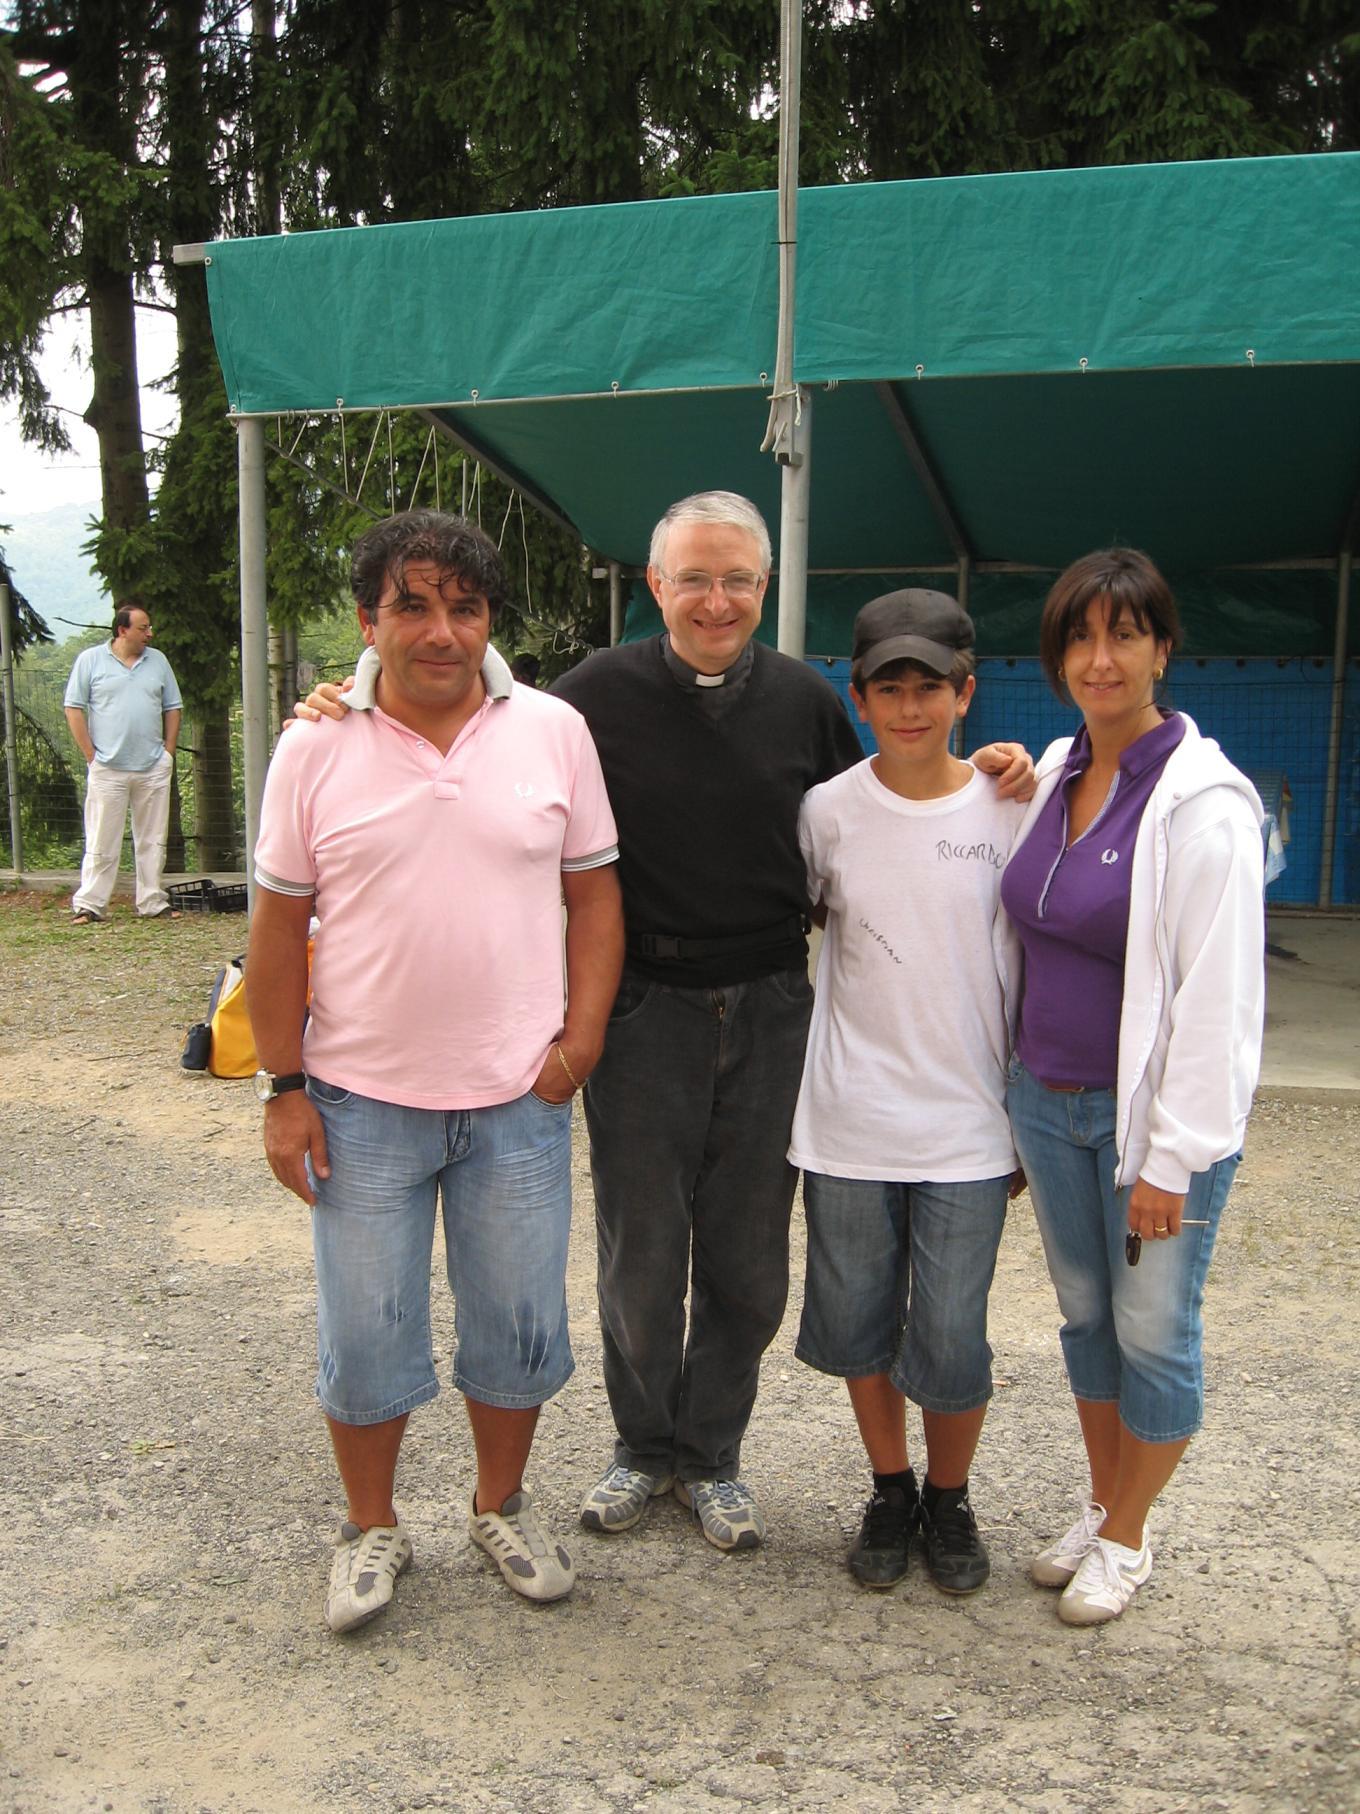 Campo_San_Giacomo_famiglie-2009-07-12--14.53.34